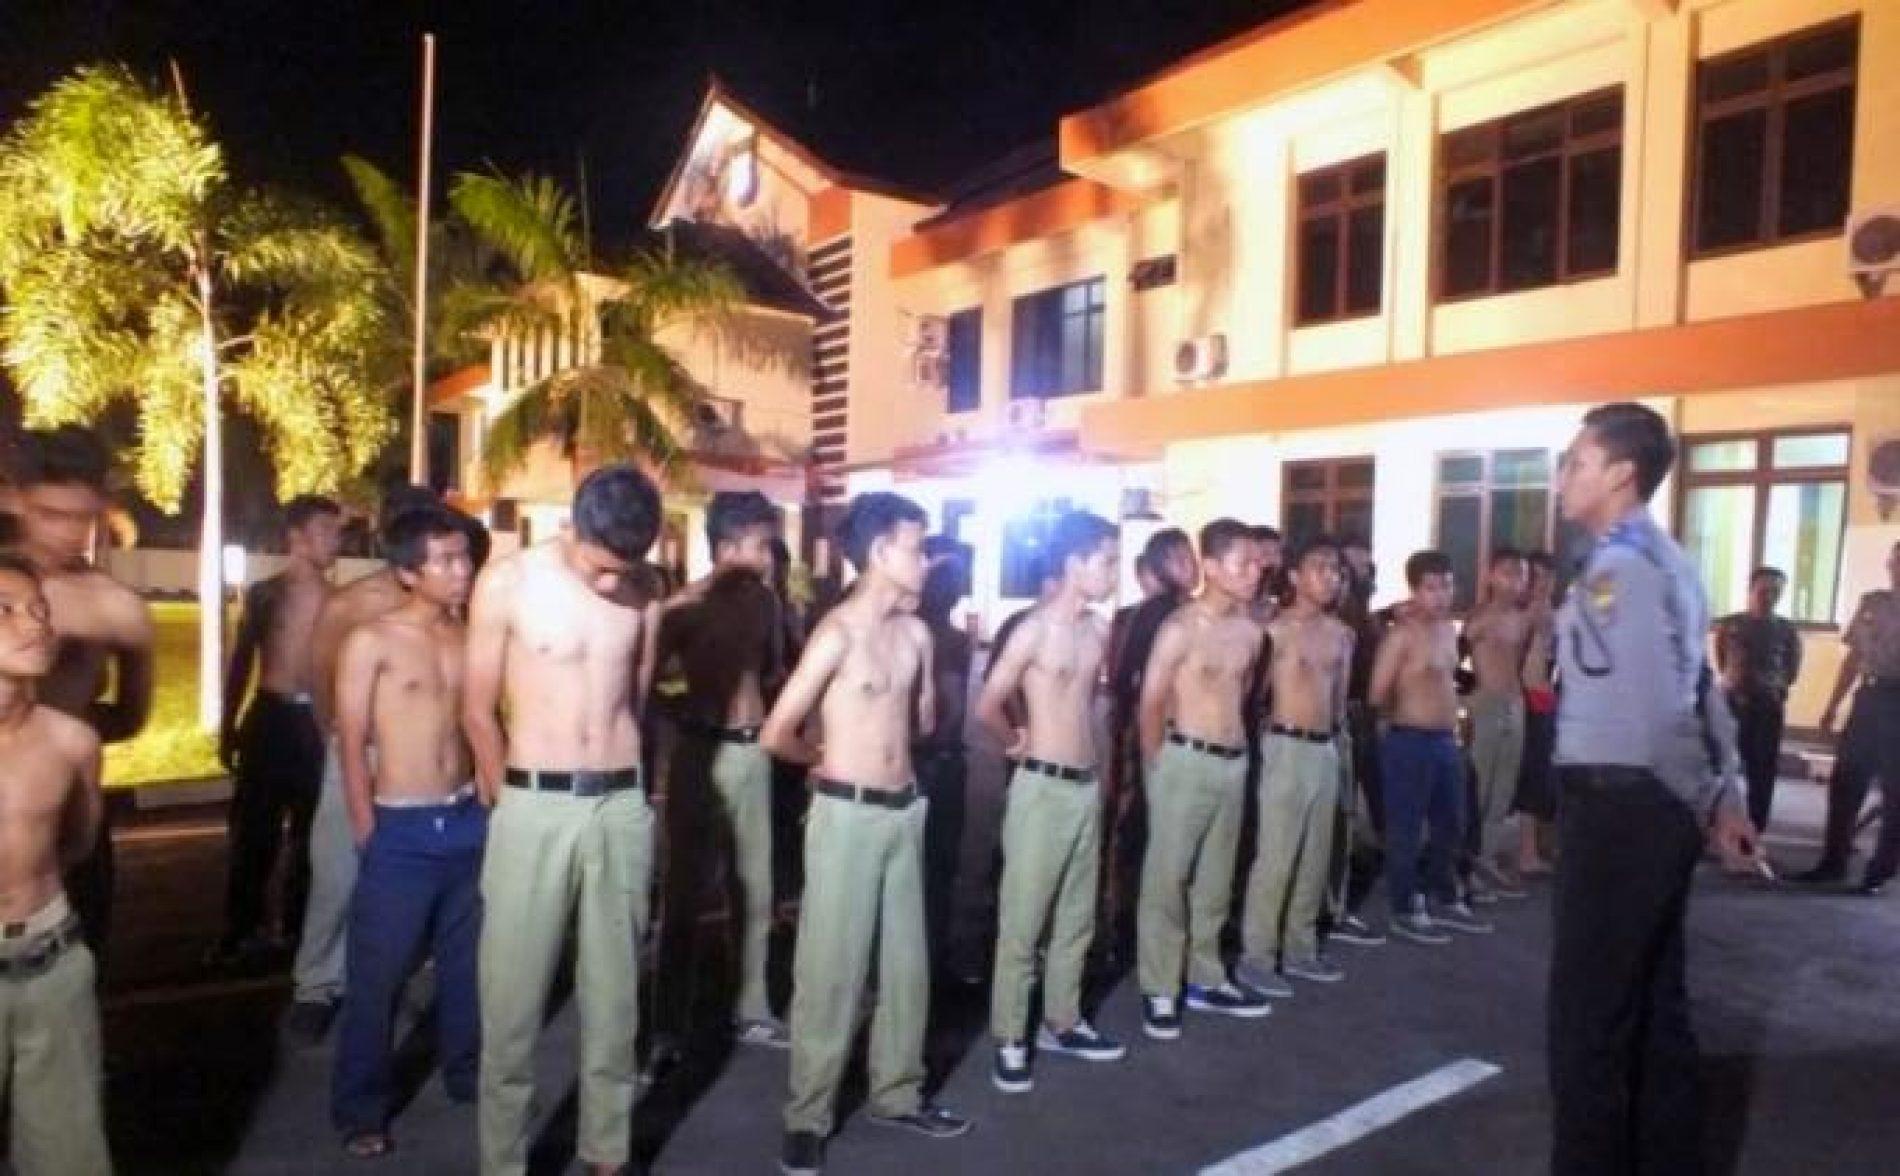 Maraknya Isu RKS KLITIH di Yogyakarta